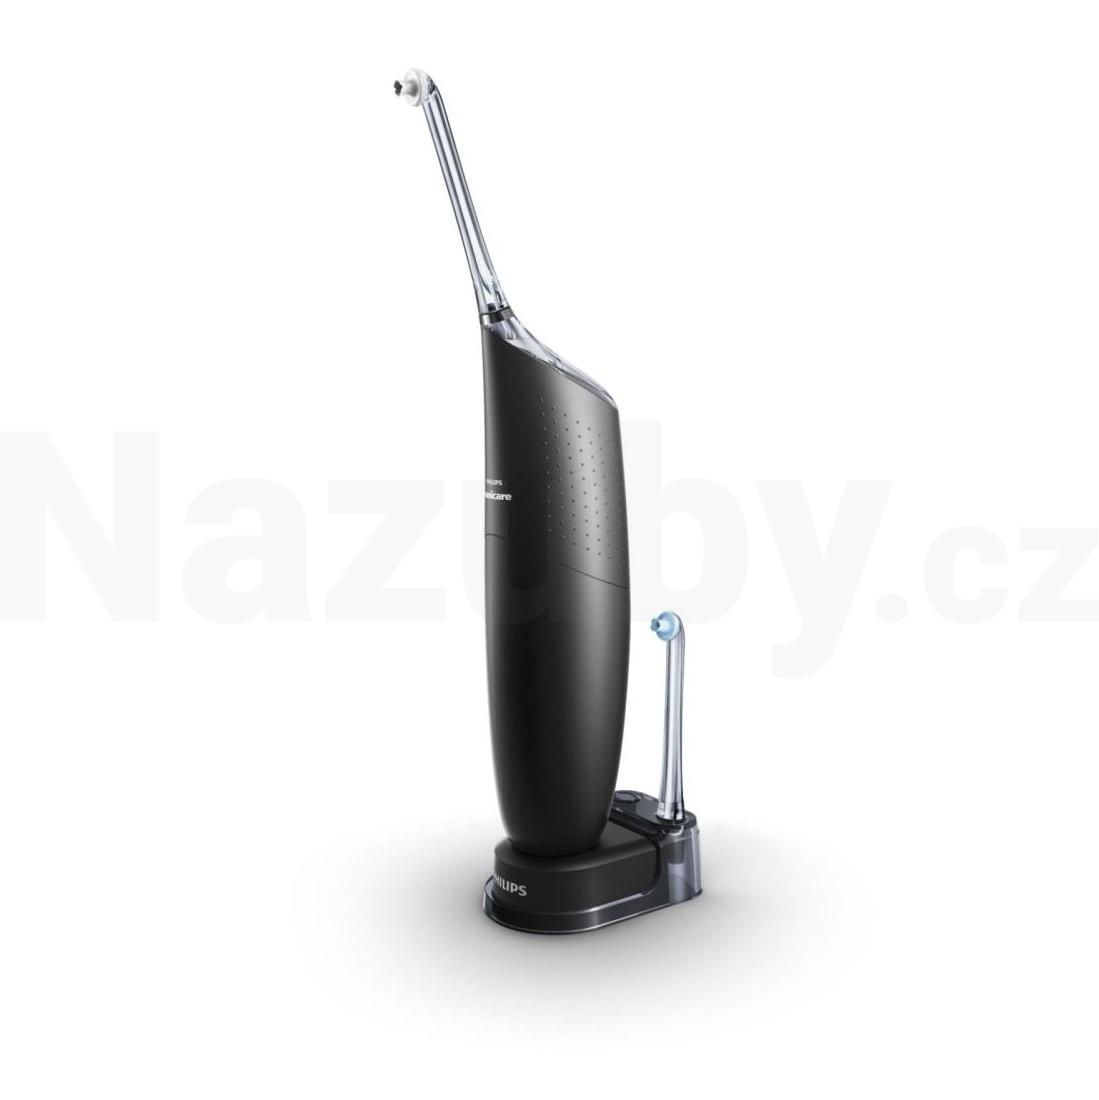 Philips Sonicare Airfloss Ultra HX8432/03 Black